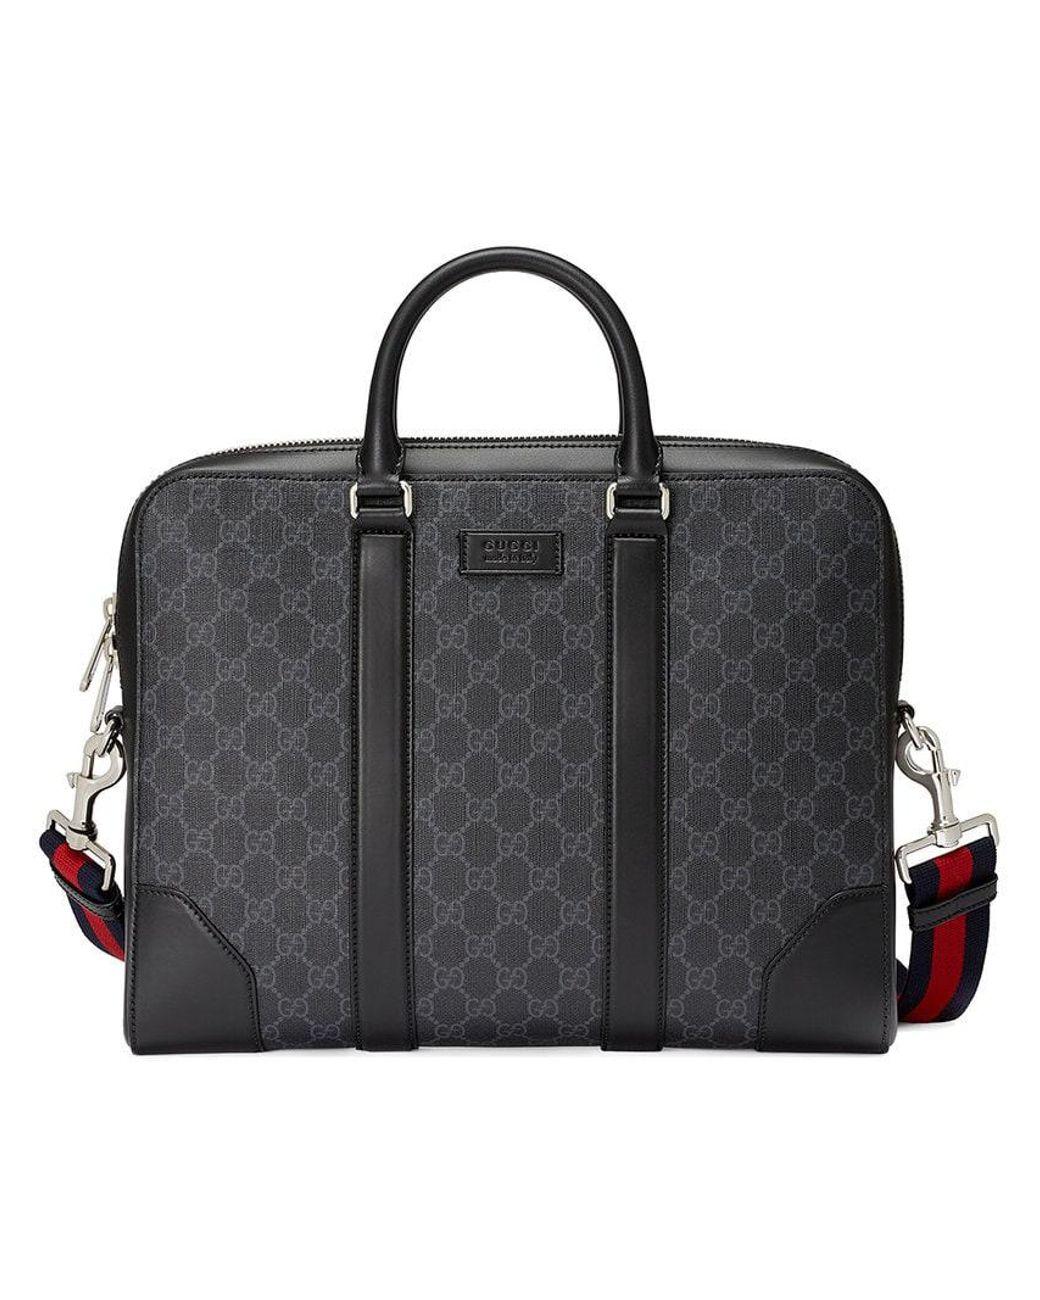 5791ed869605 Gucci GG Supreme Briefcase in Black for Men - Save 12% - Lyst